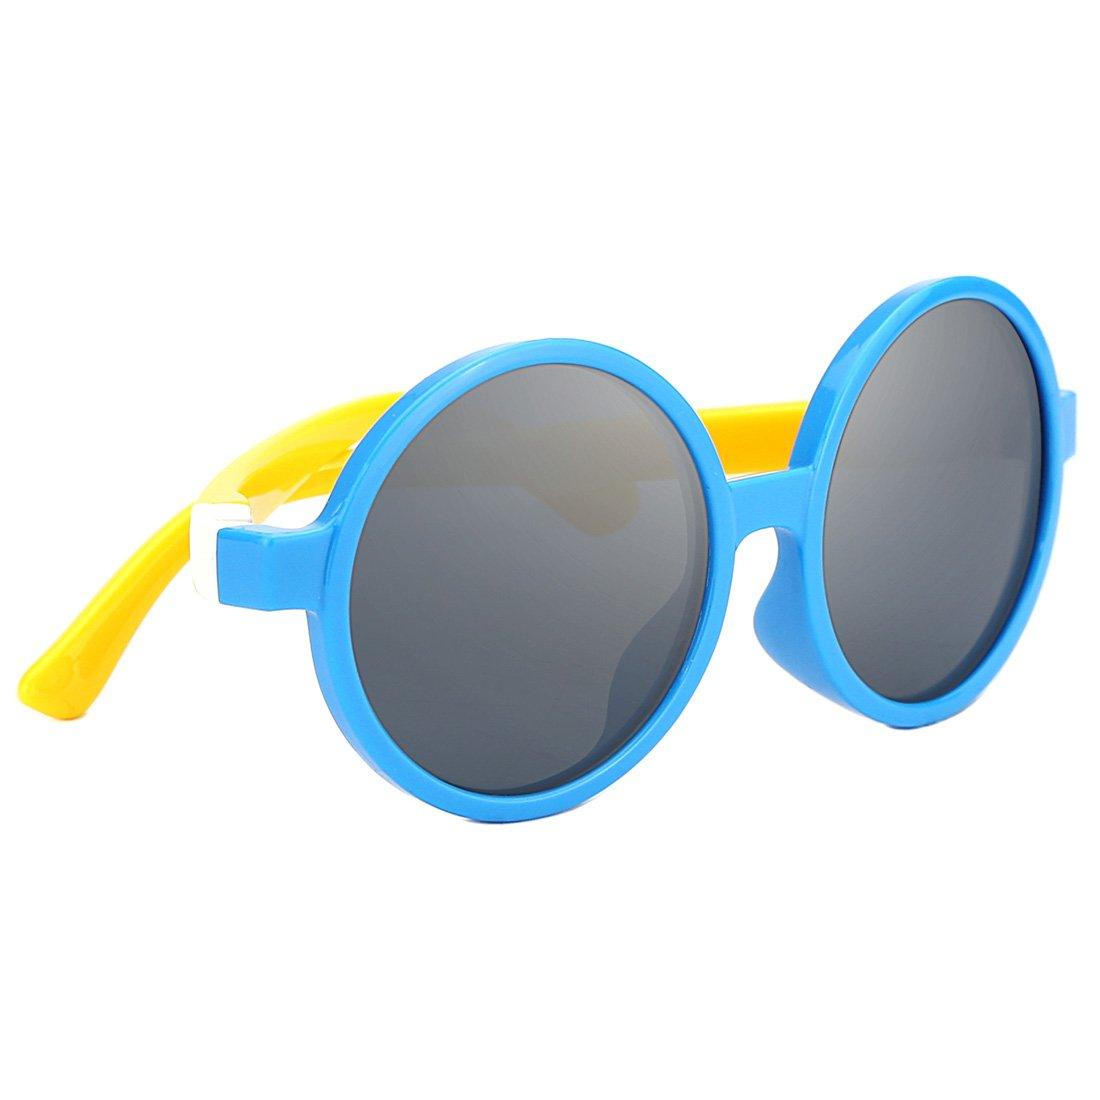 TIJN Kids Toddler Flexiable Rubber Polarized Round Sunglasses for Girl Boys 10022003